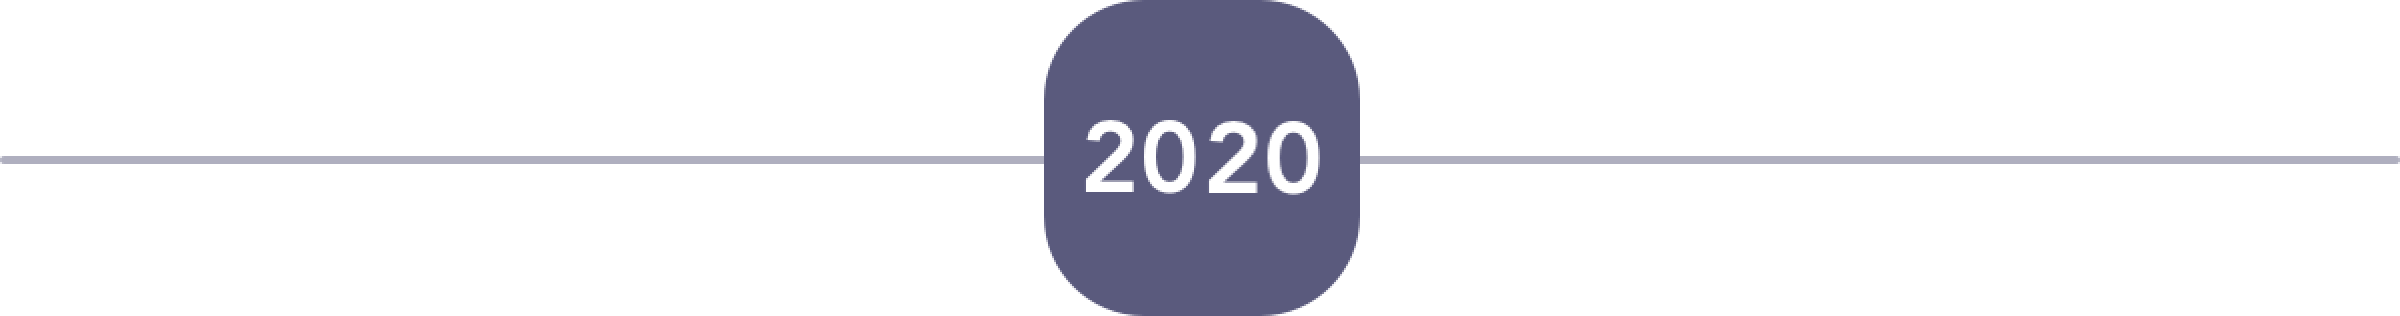 2020 year